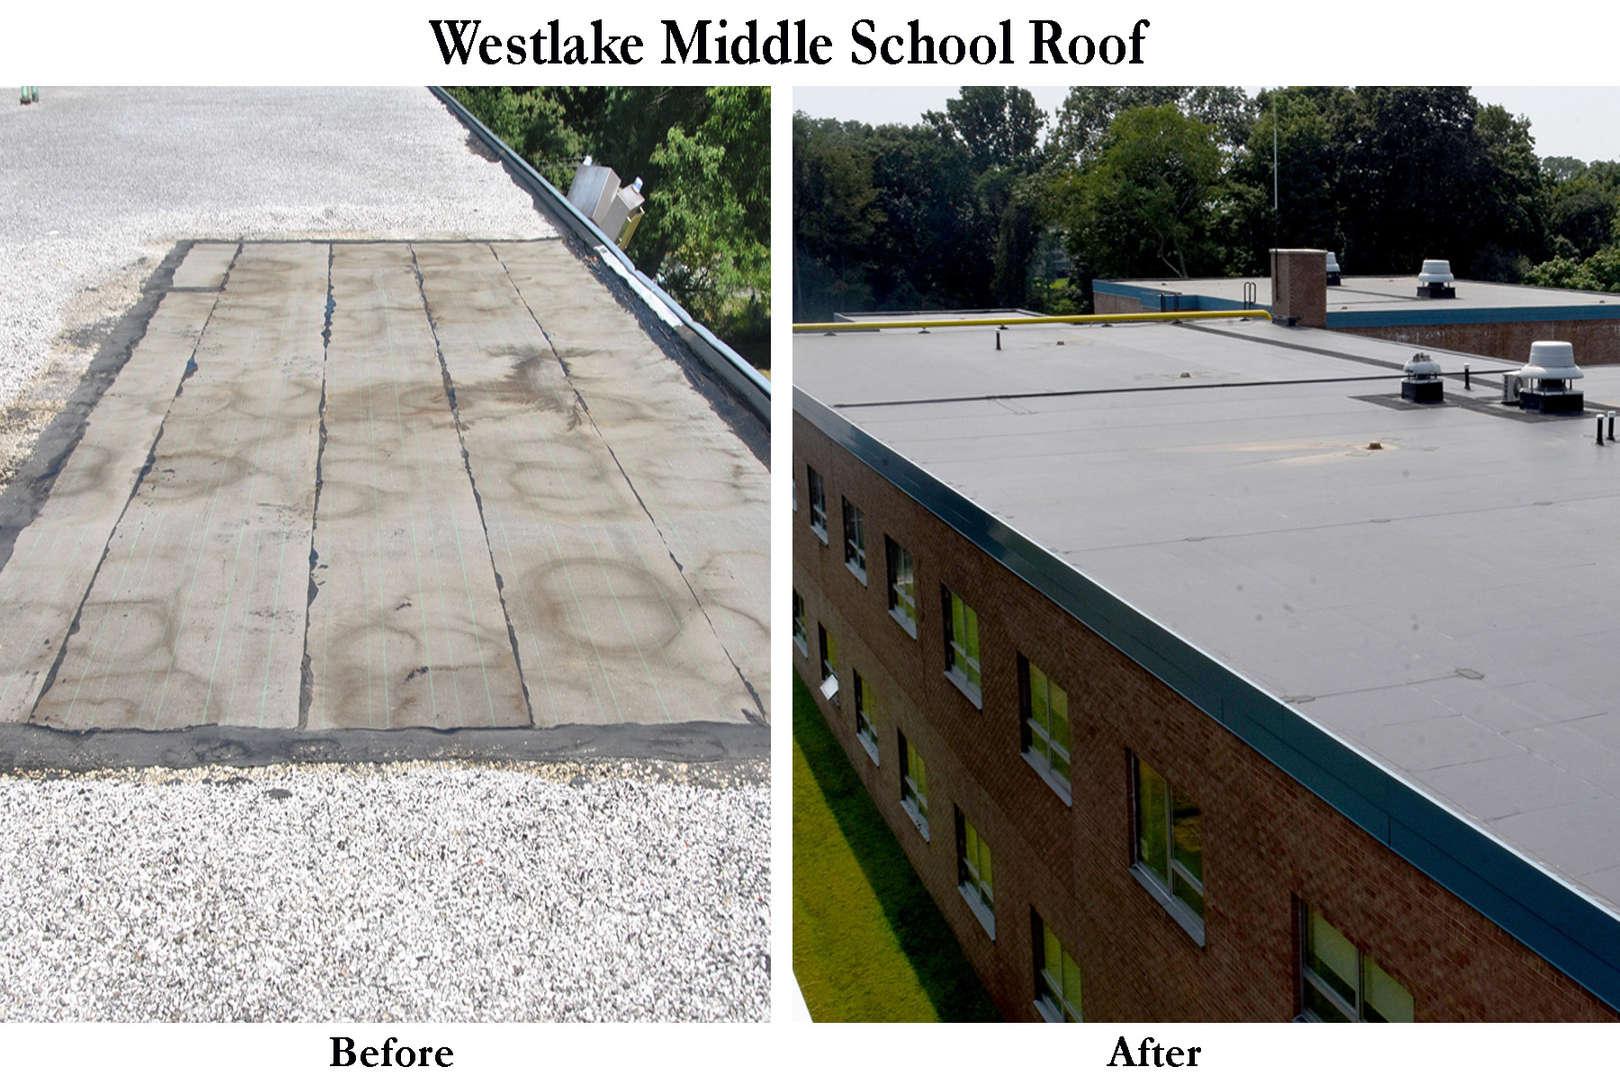 WMS Roof